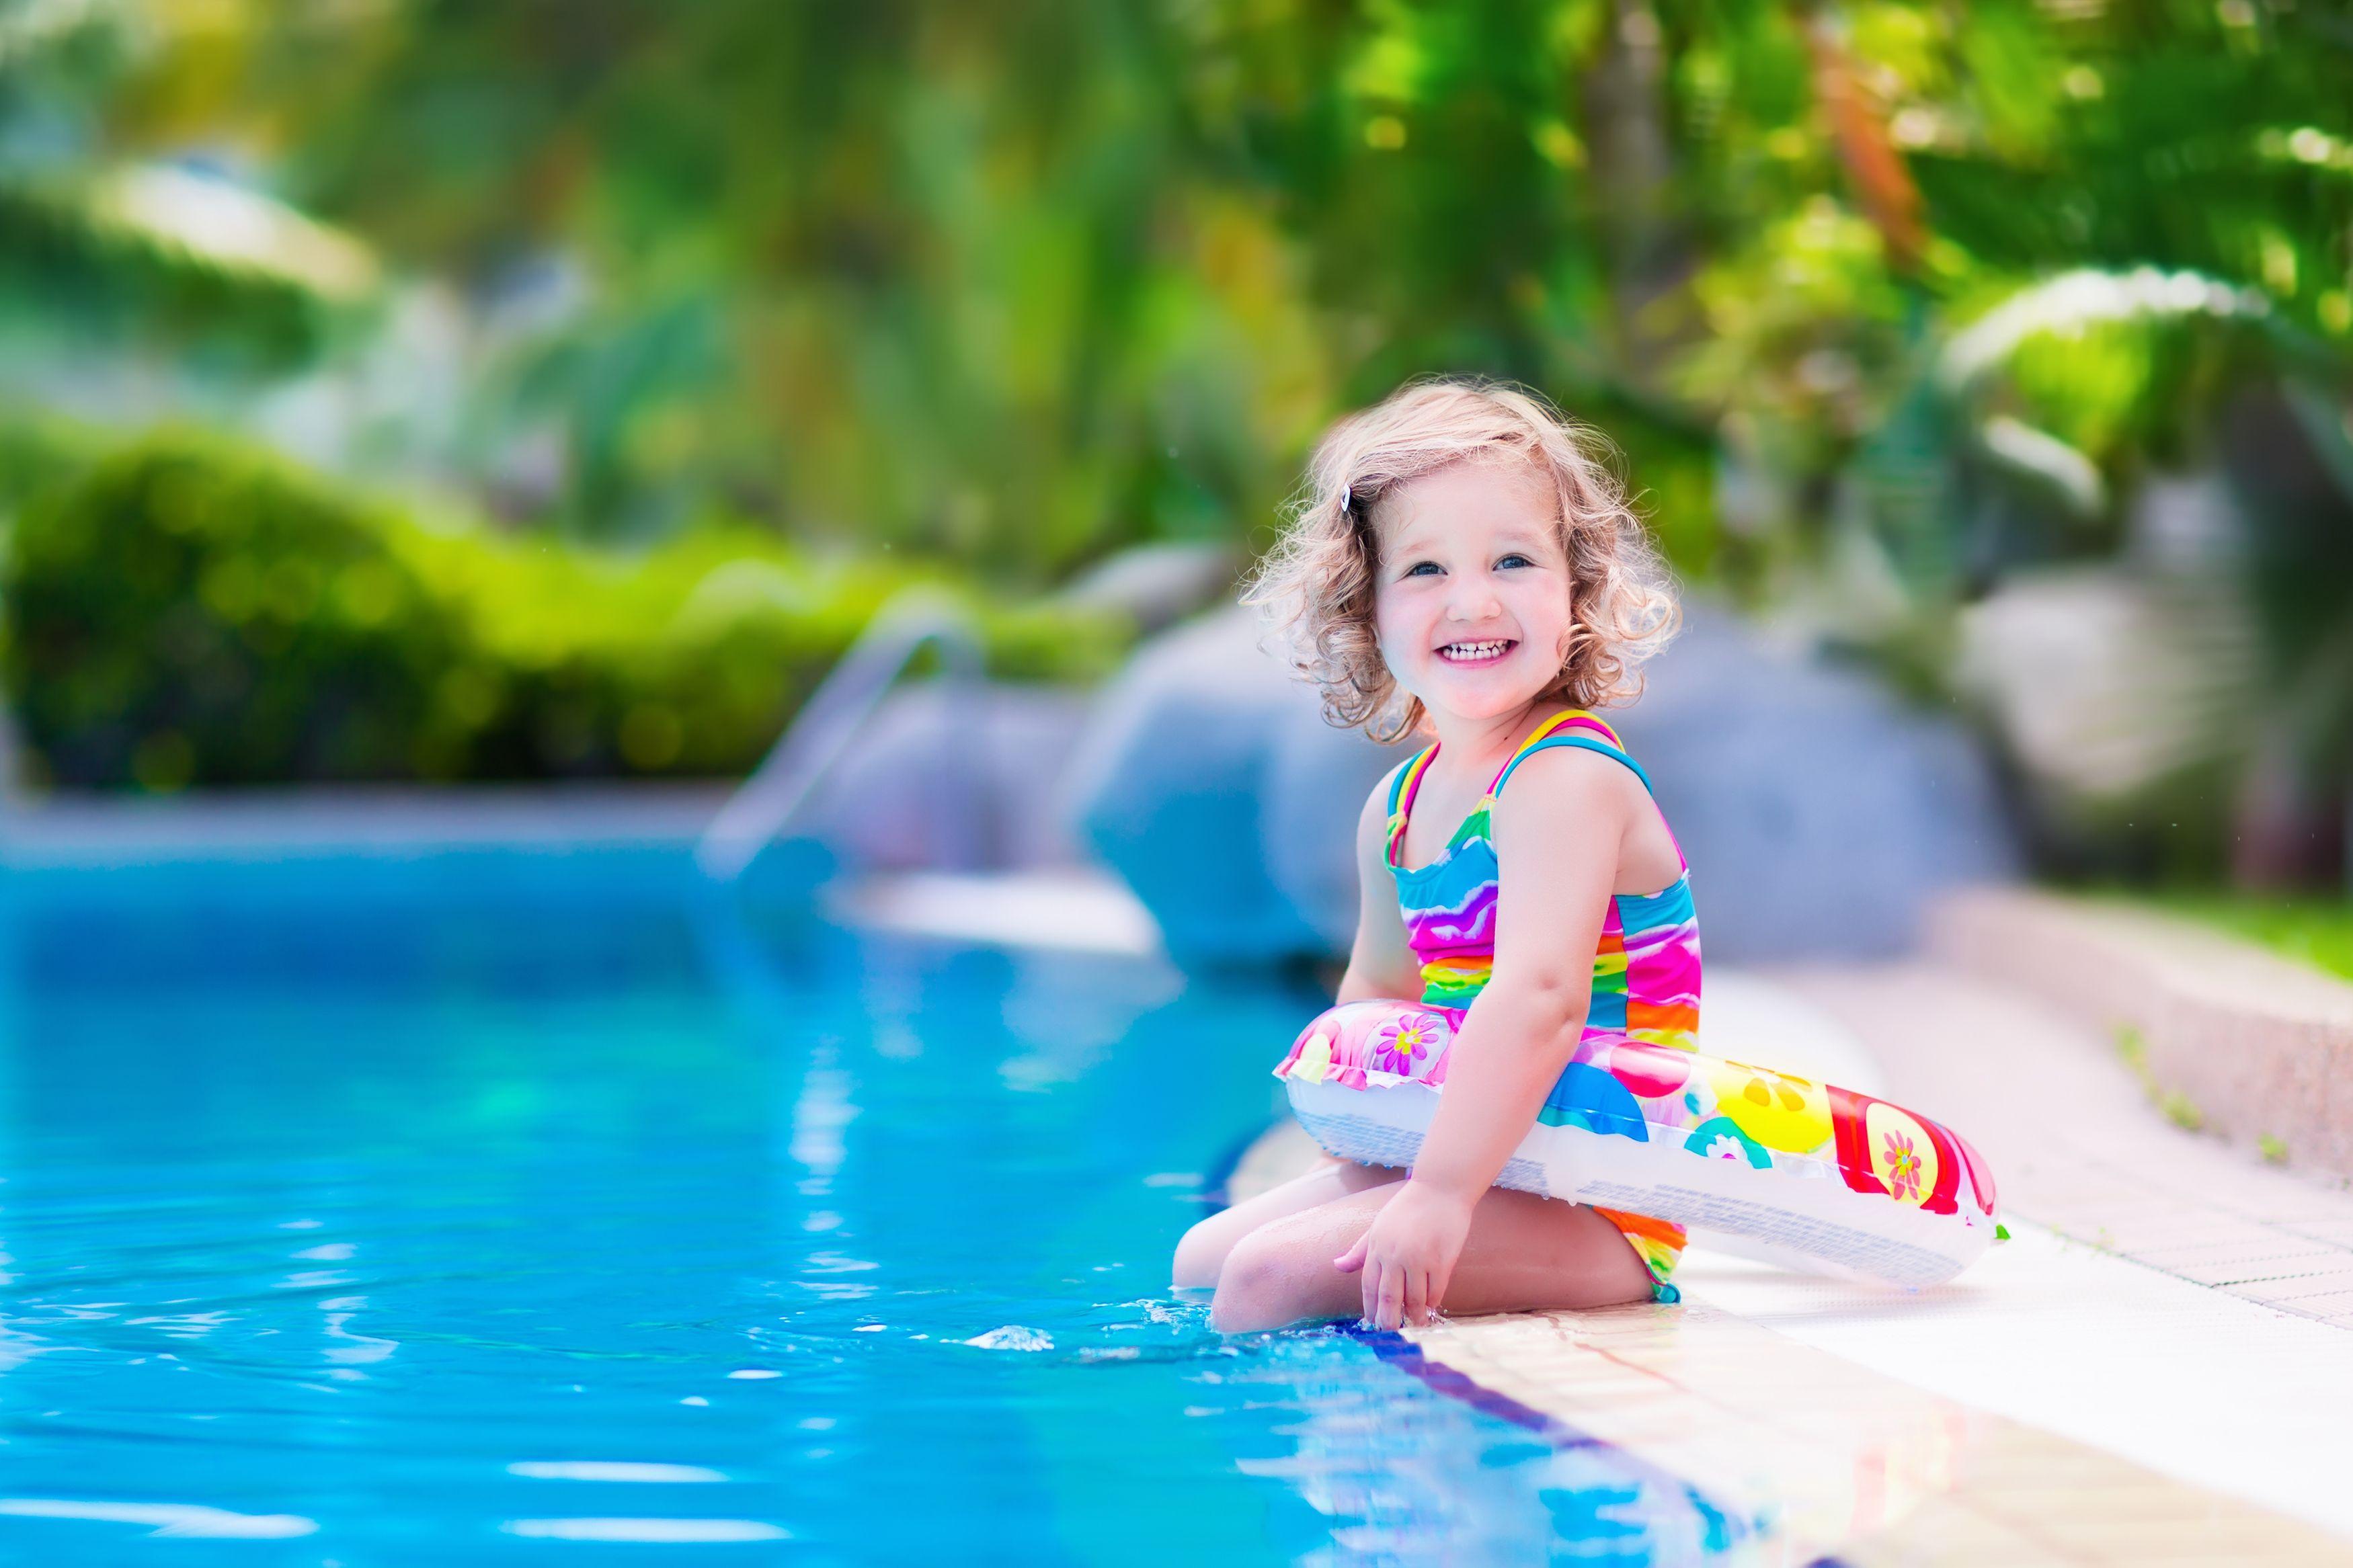 Activities To Teach Water Safety To Preschoolers